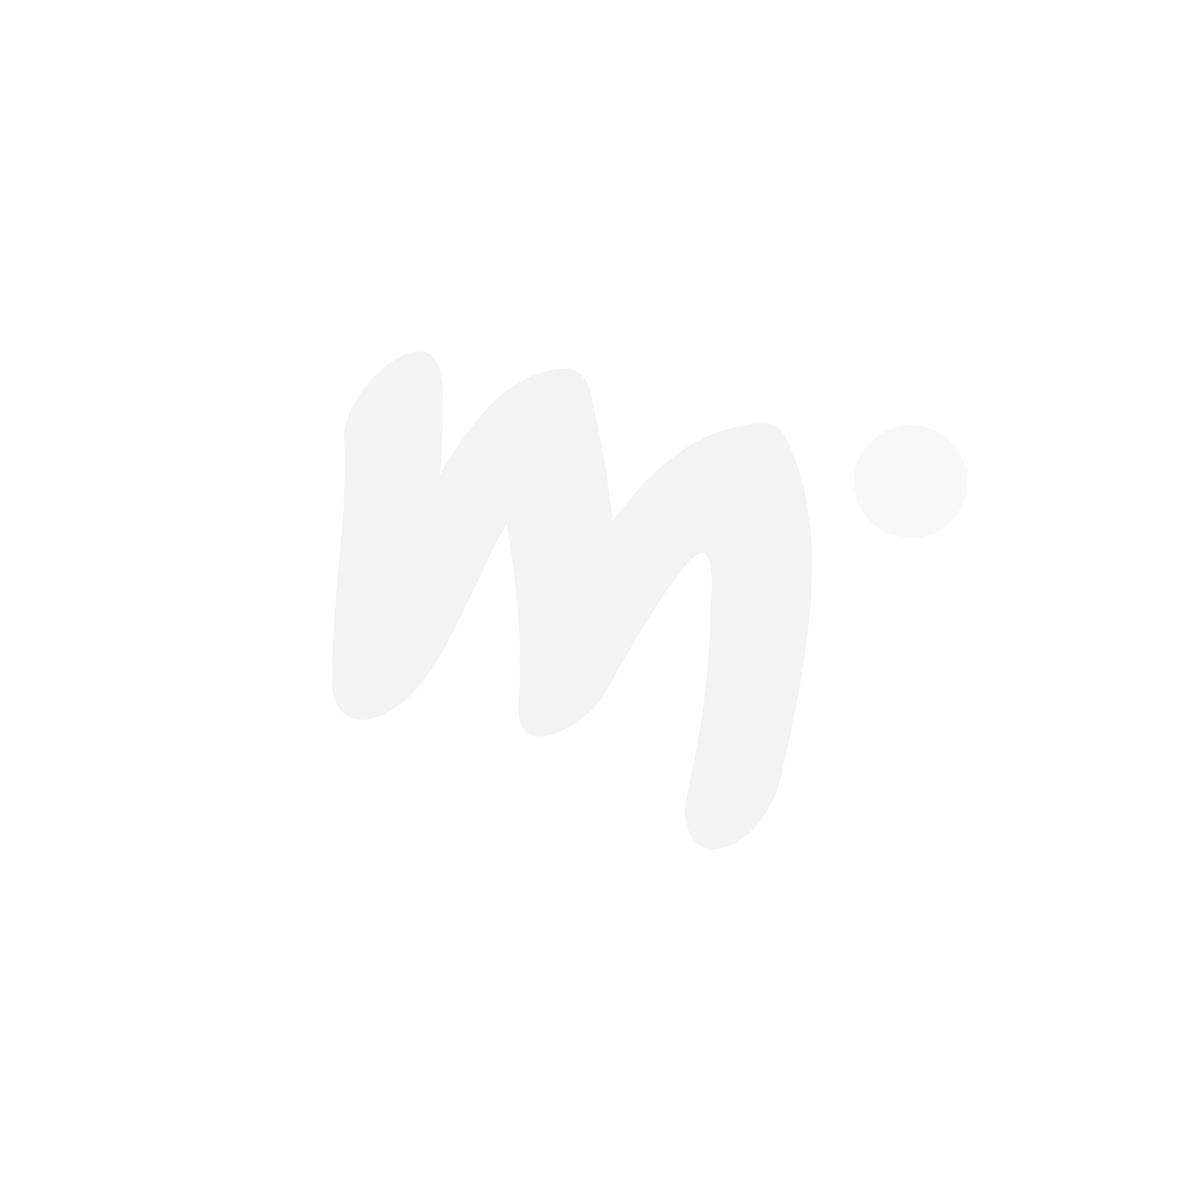 Muumi Kiipeilypuu-kaftaani harmaa